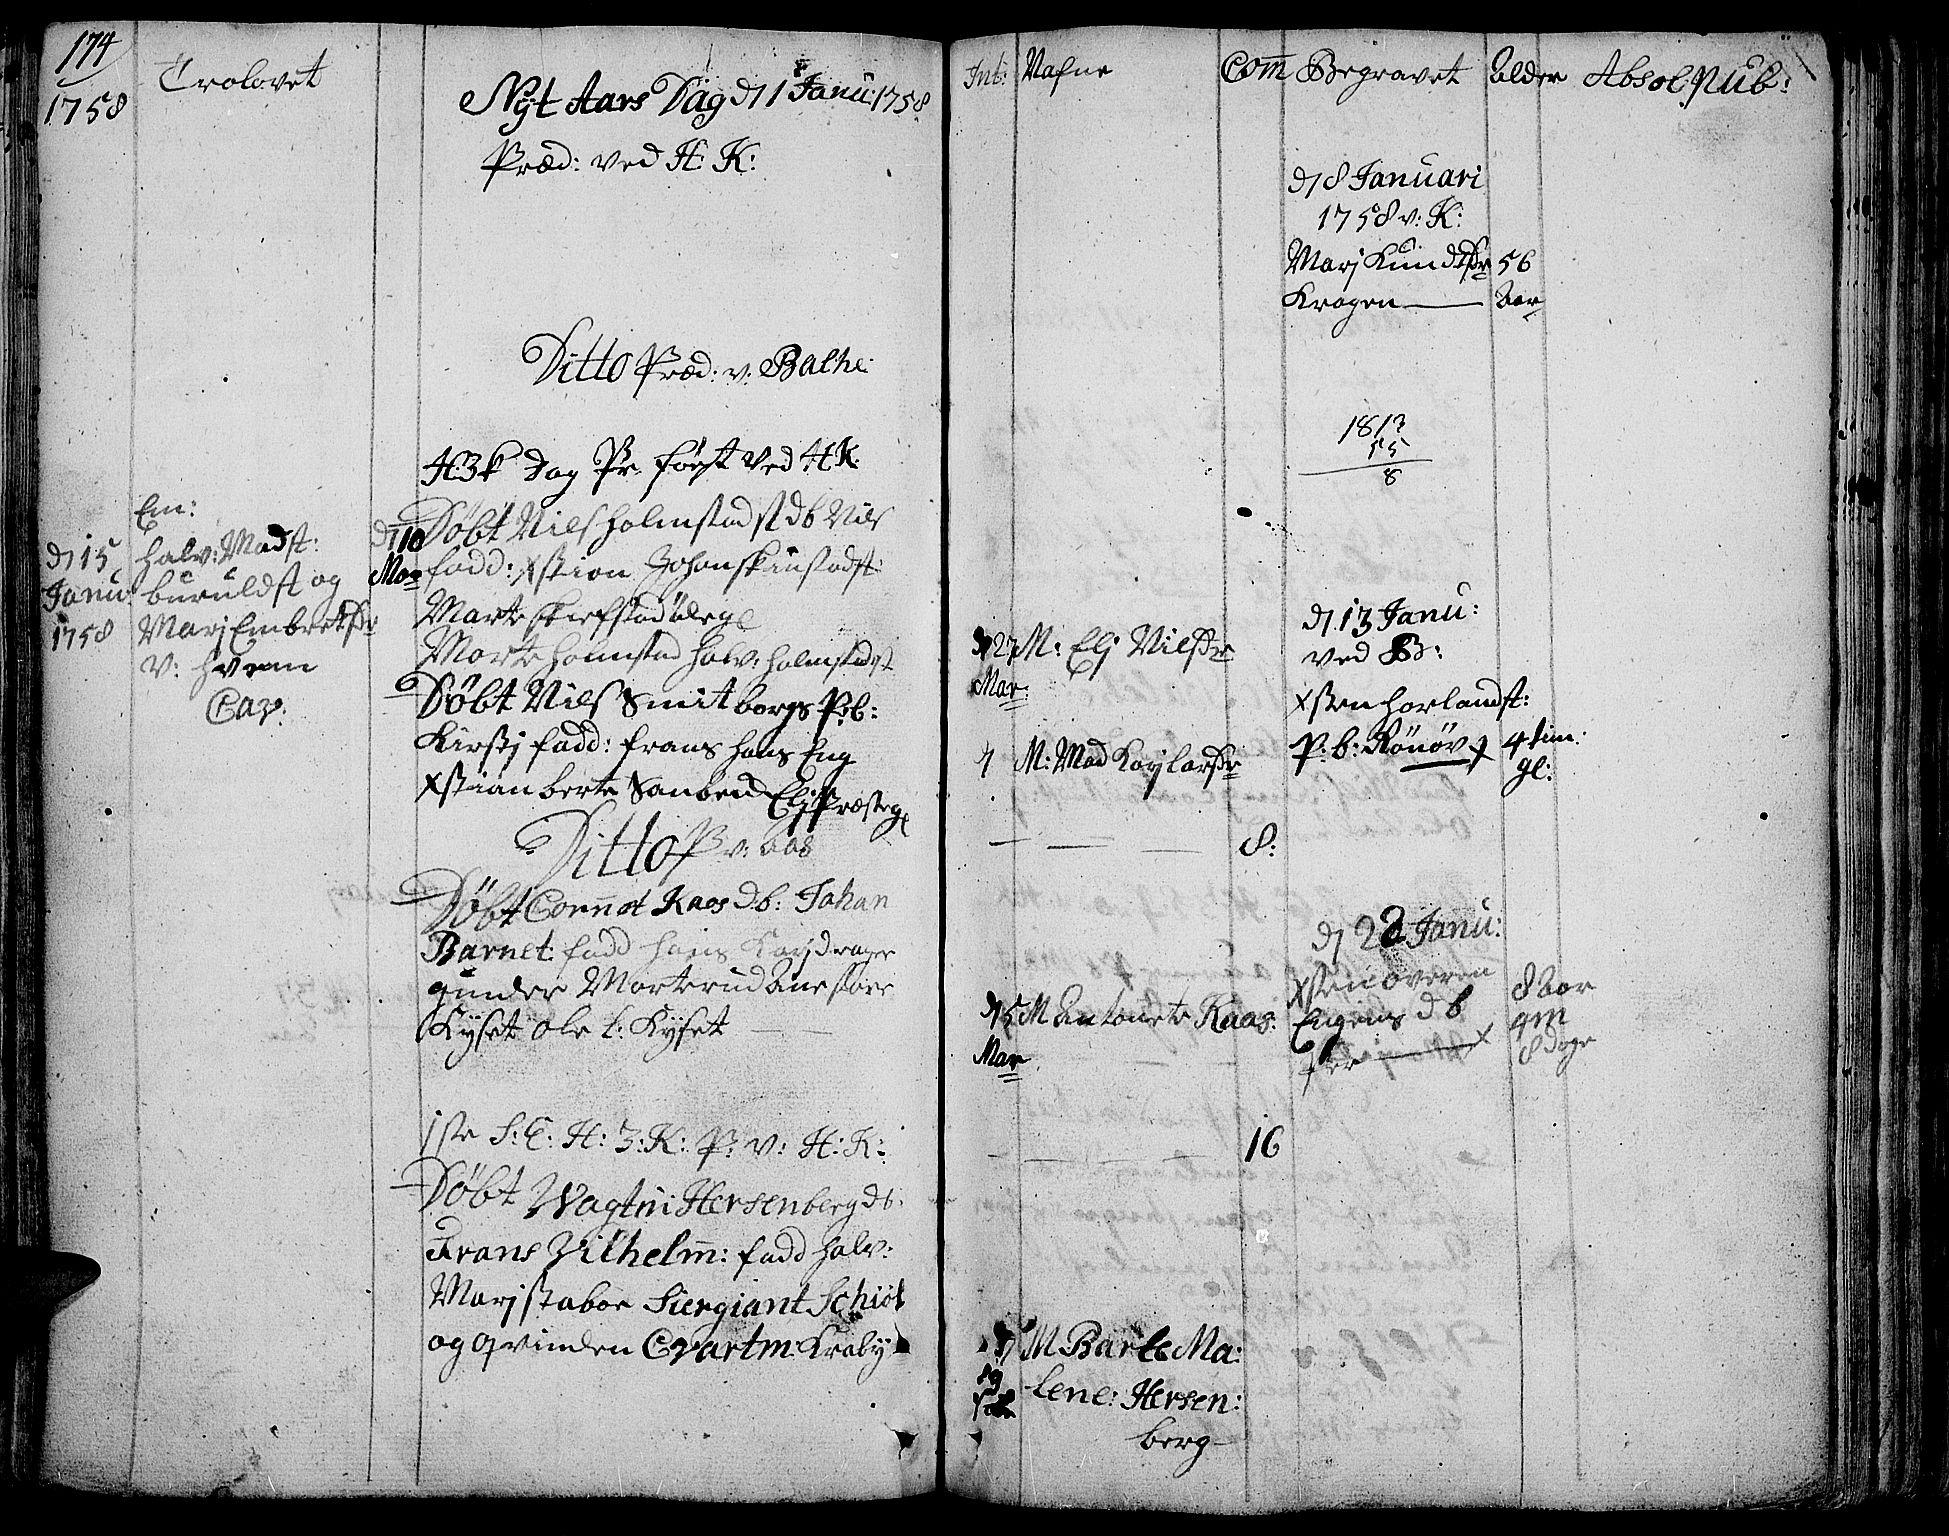 SAH, Toten prestekontor, Ministerialbok nr. 4, 1751-1761, s. 174